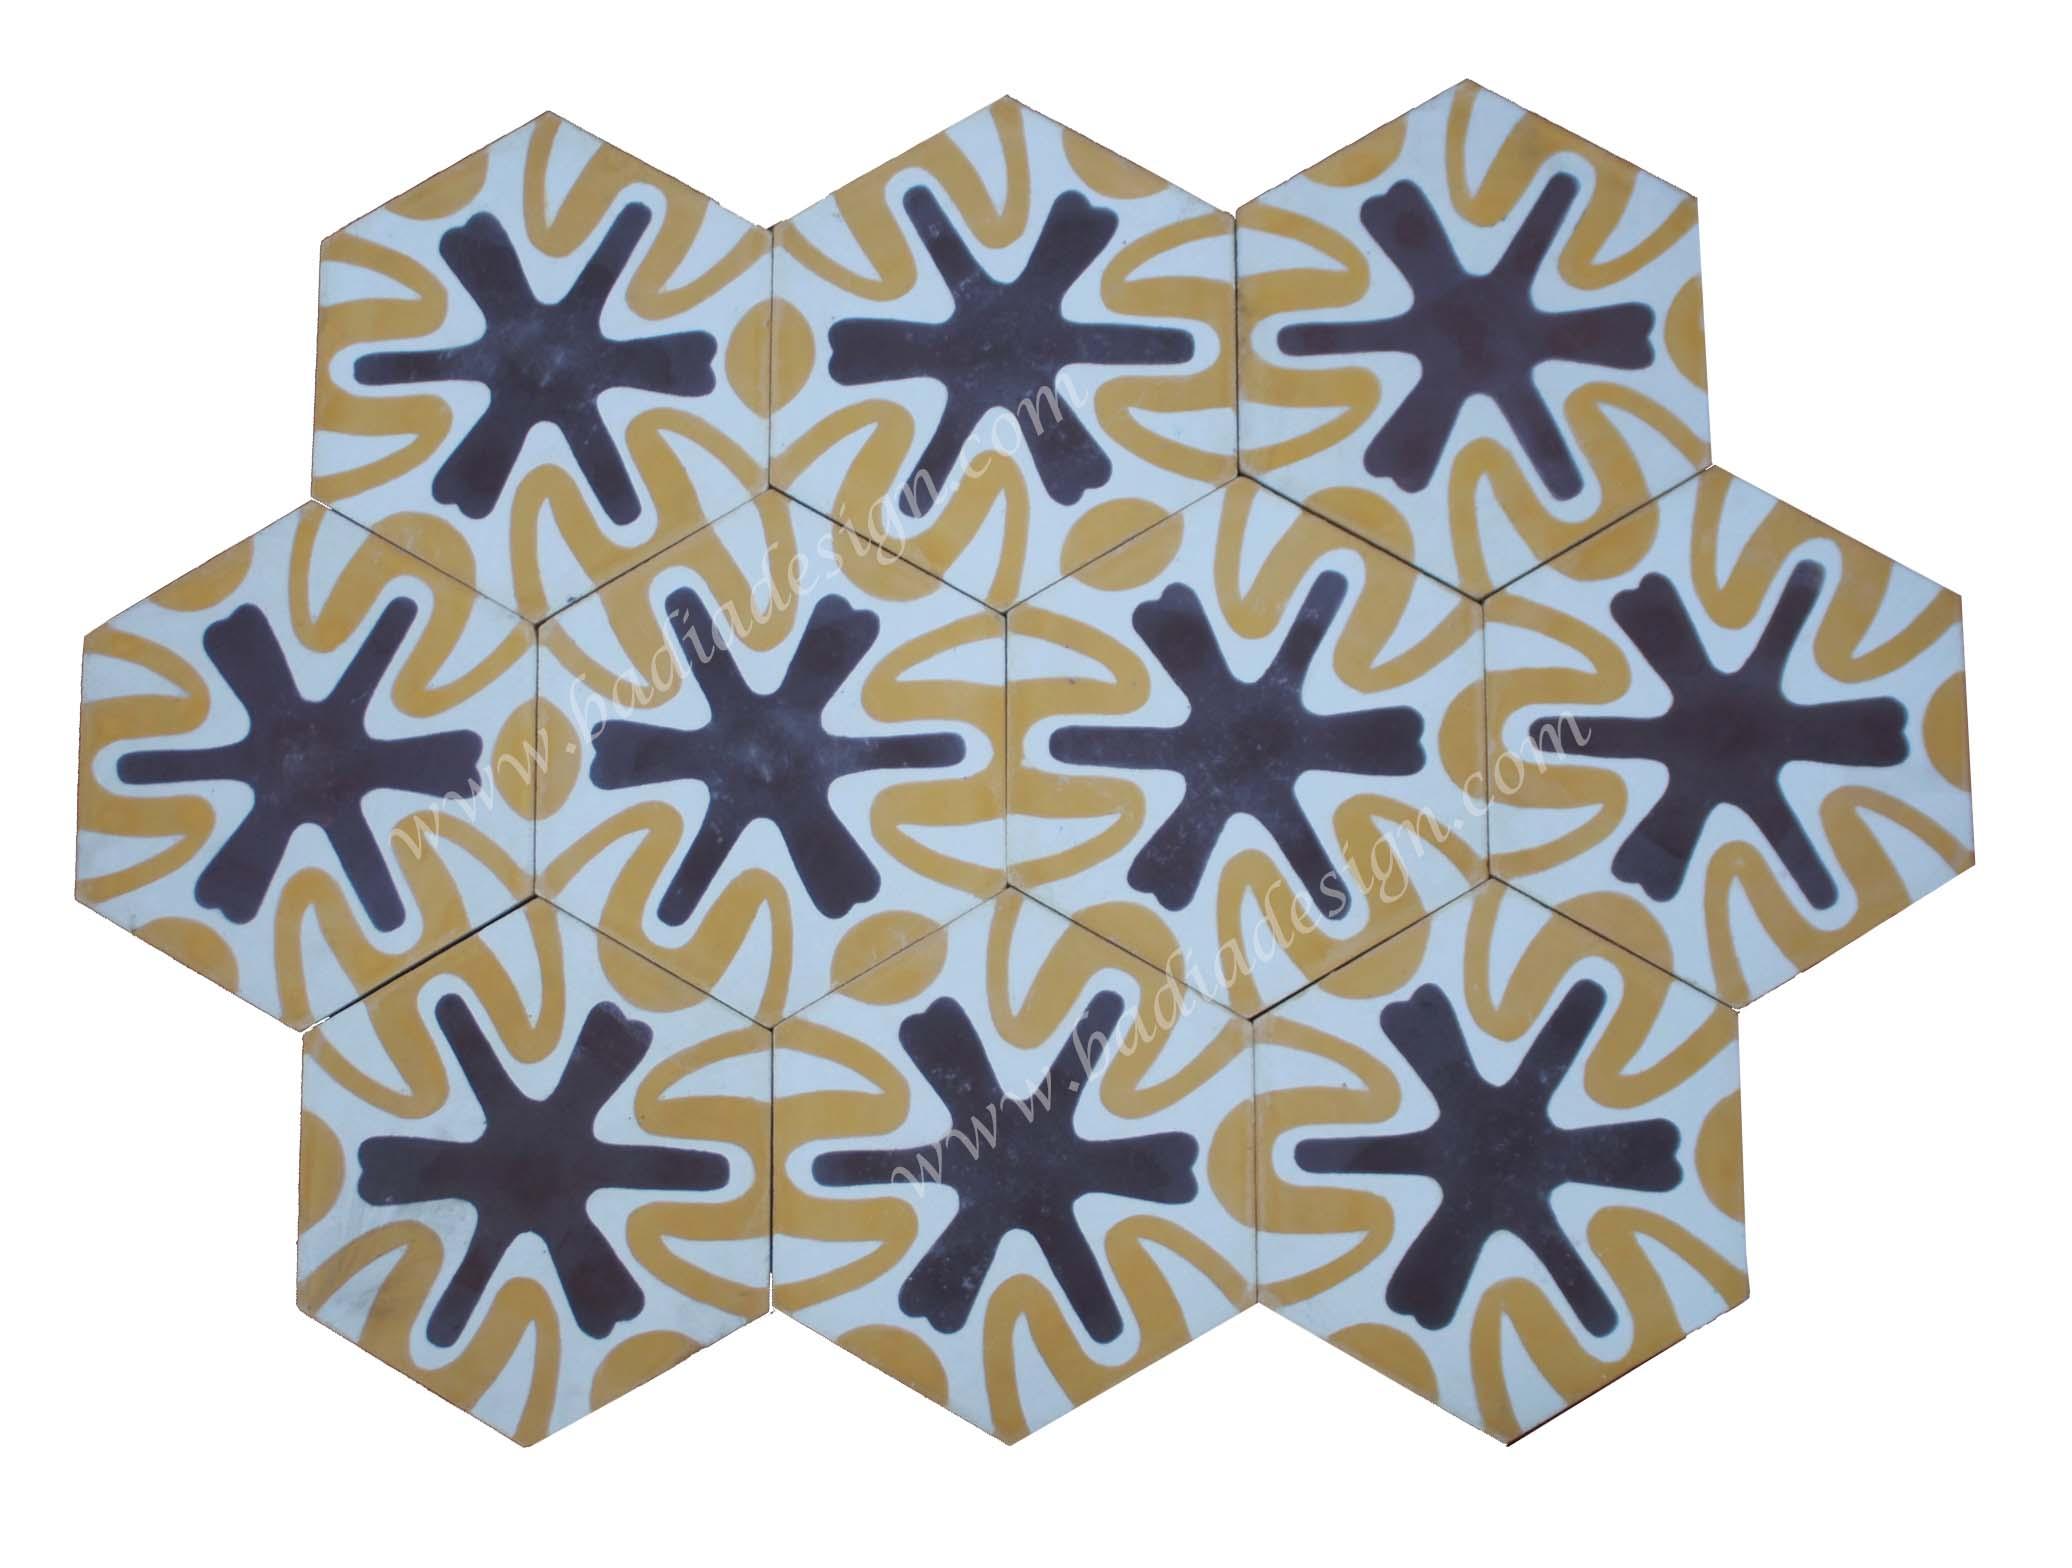 moroccan-hexagon-shaped-tile-ct097-1.jpg